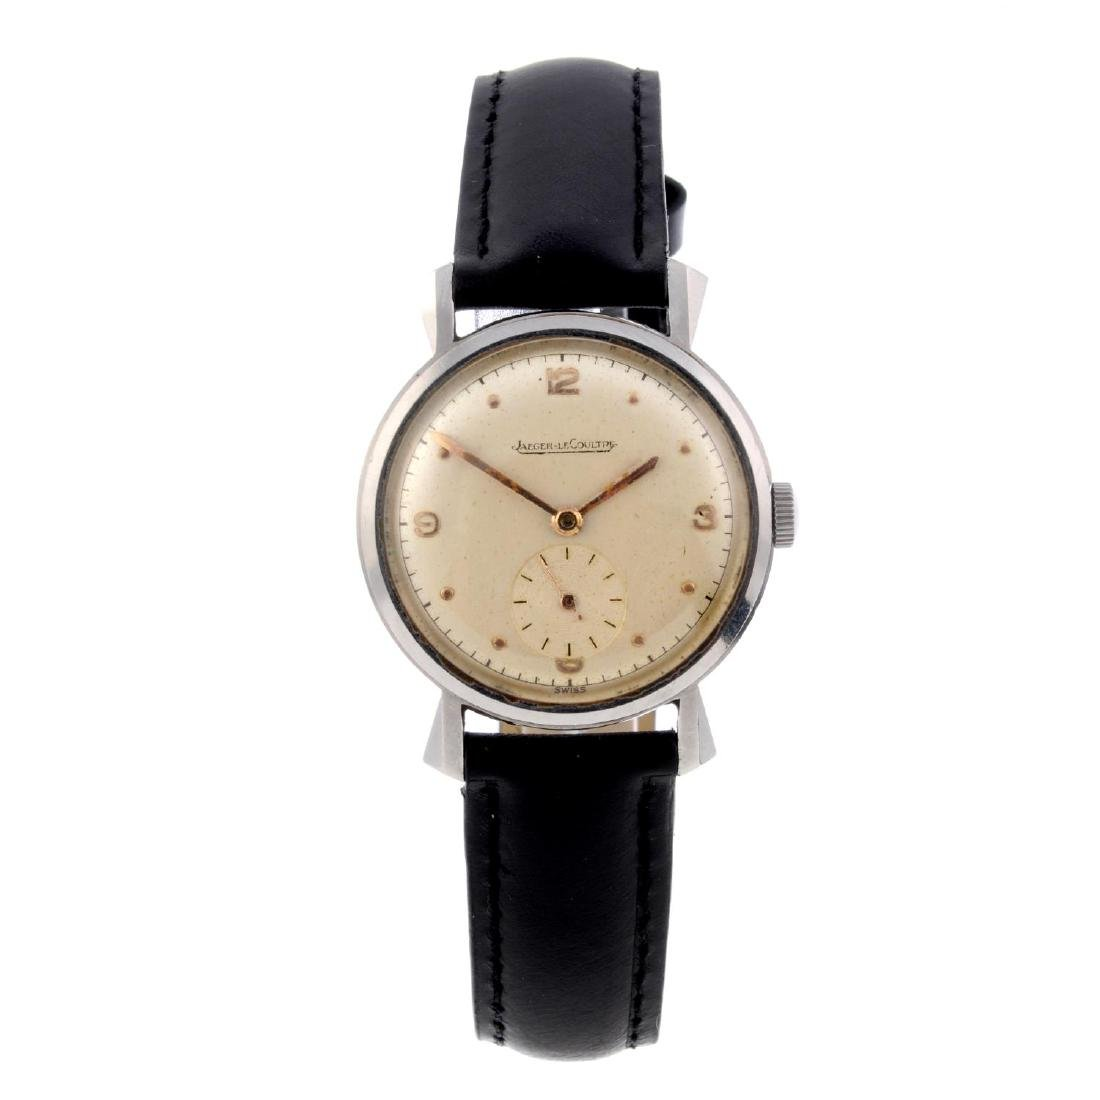 JAEGER-LECOULTRE - a gentleman's wrist watch. Stainless